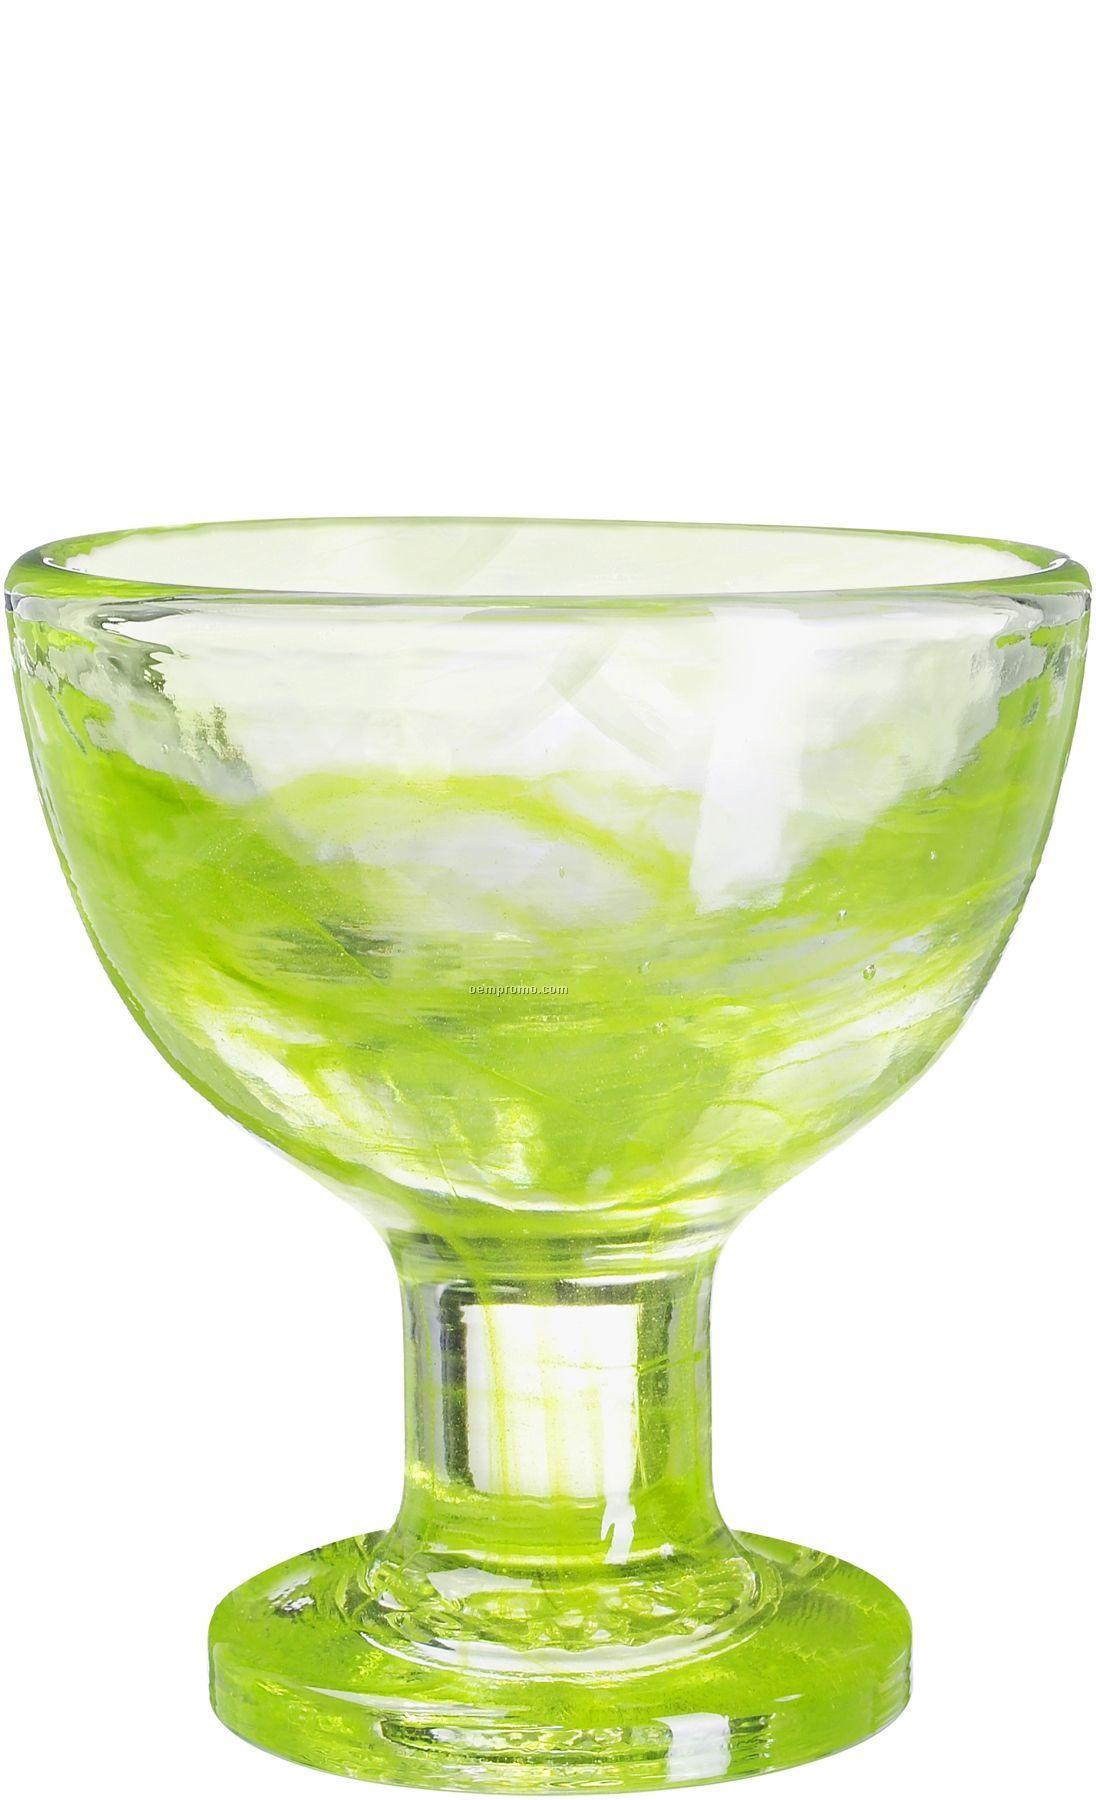 Mine Glass Ice Cream Dish By Ulrica Hydman-vallien